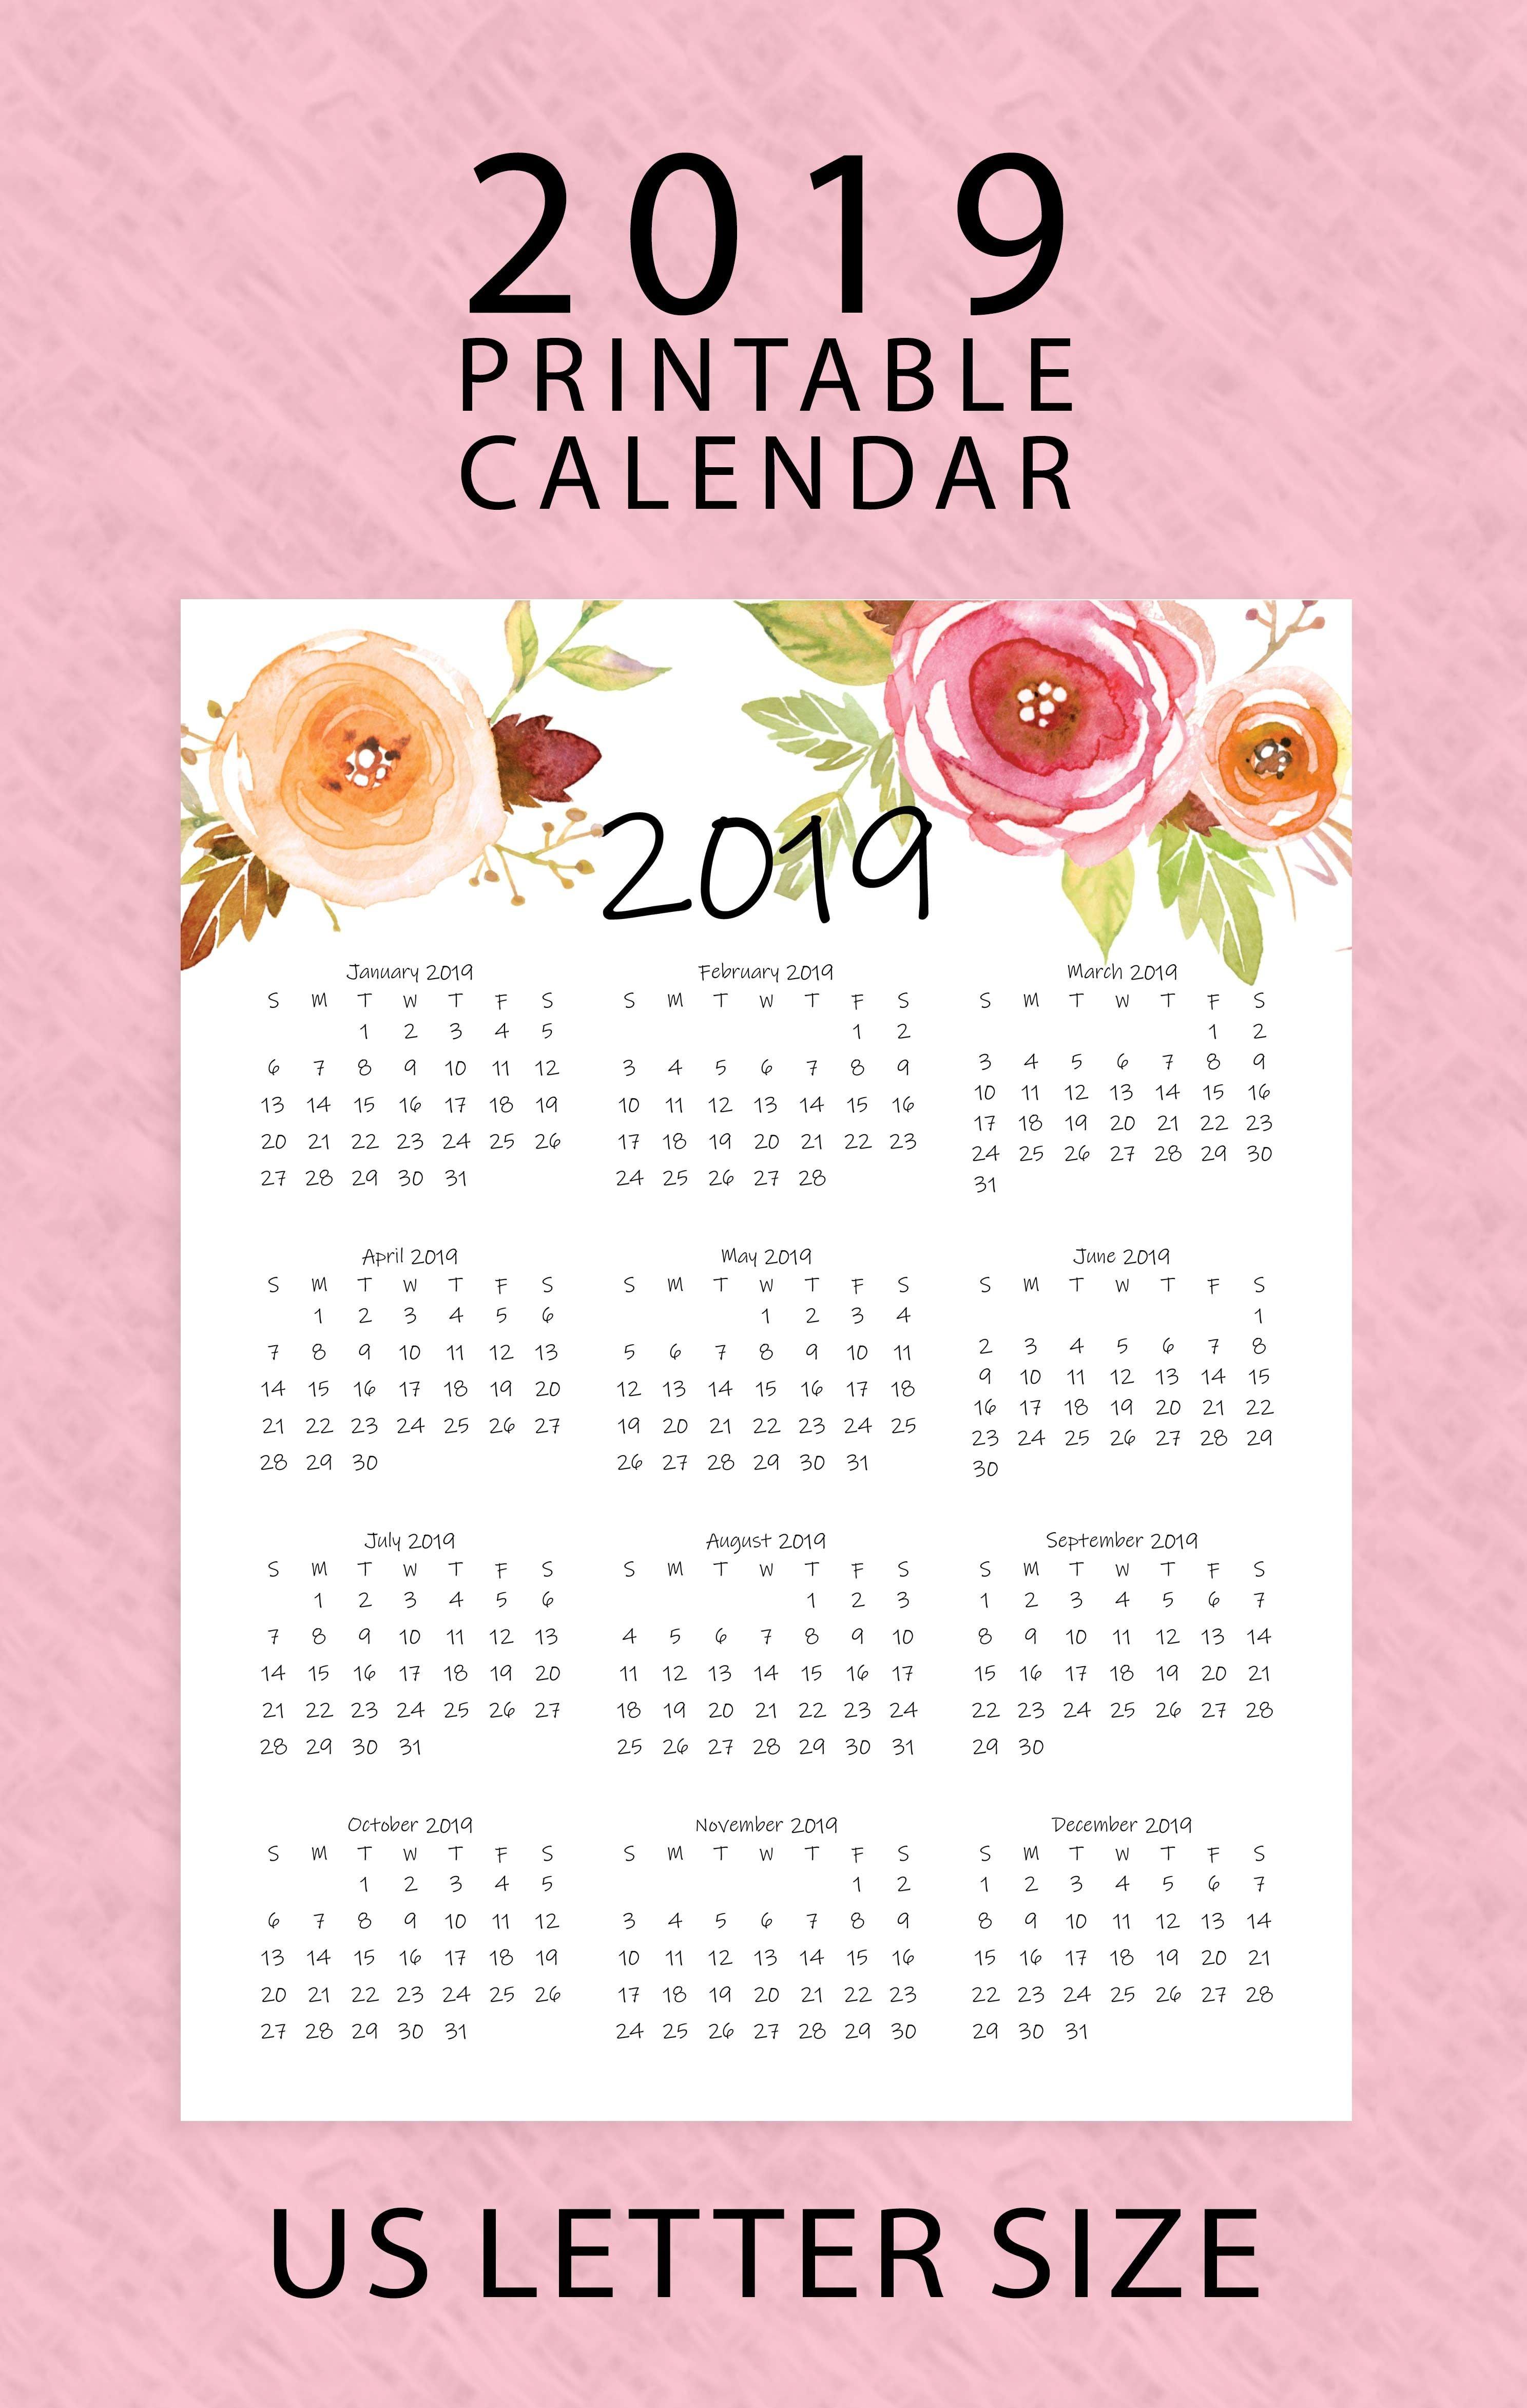 Year At A Glance Calendar 2019 | Printable Calendar | Letter Size X Calendar 2019 Download